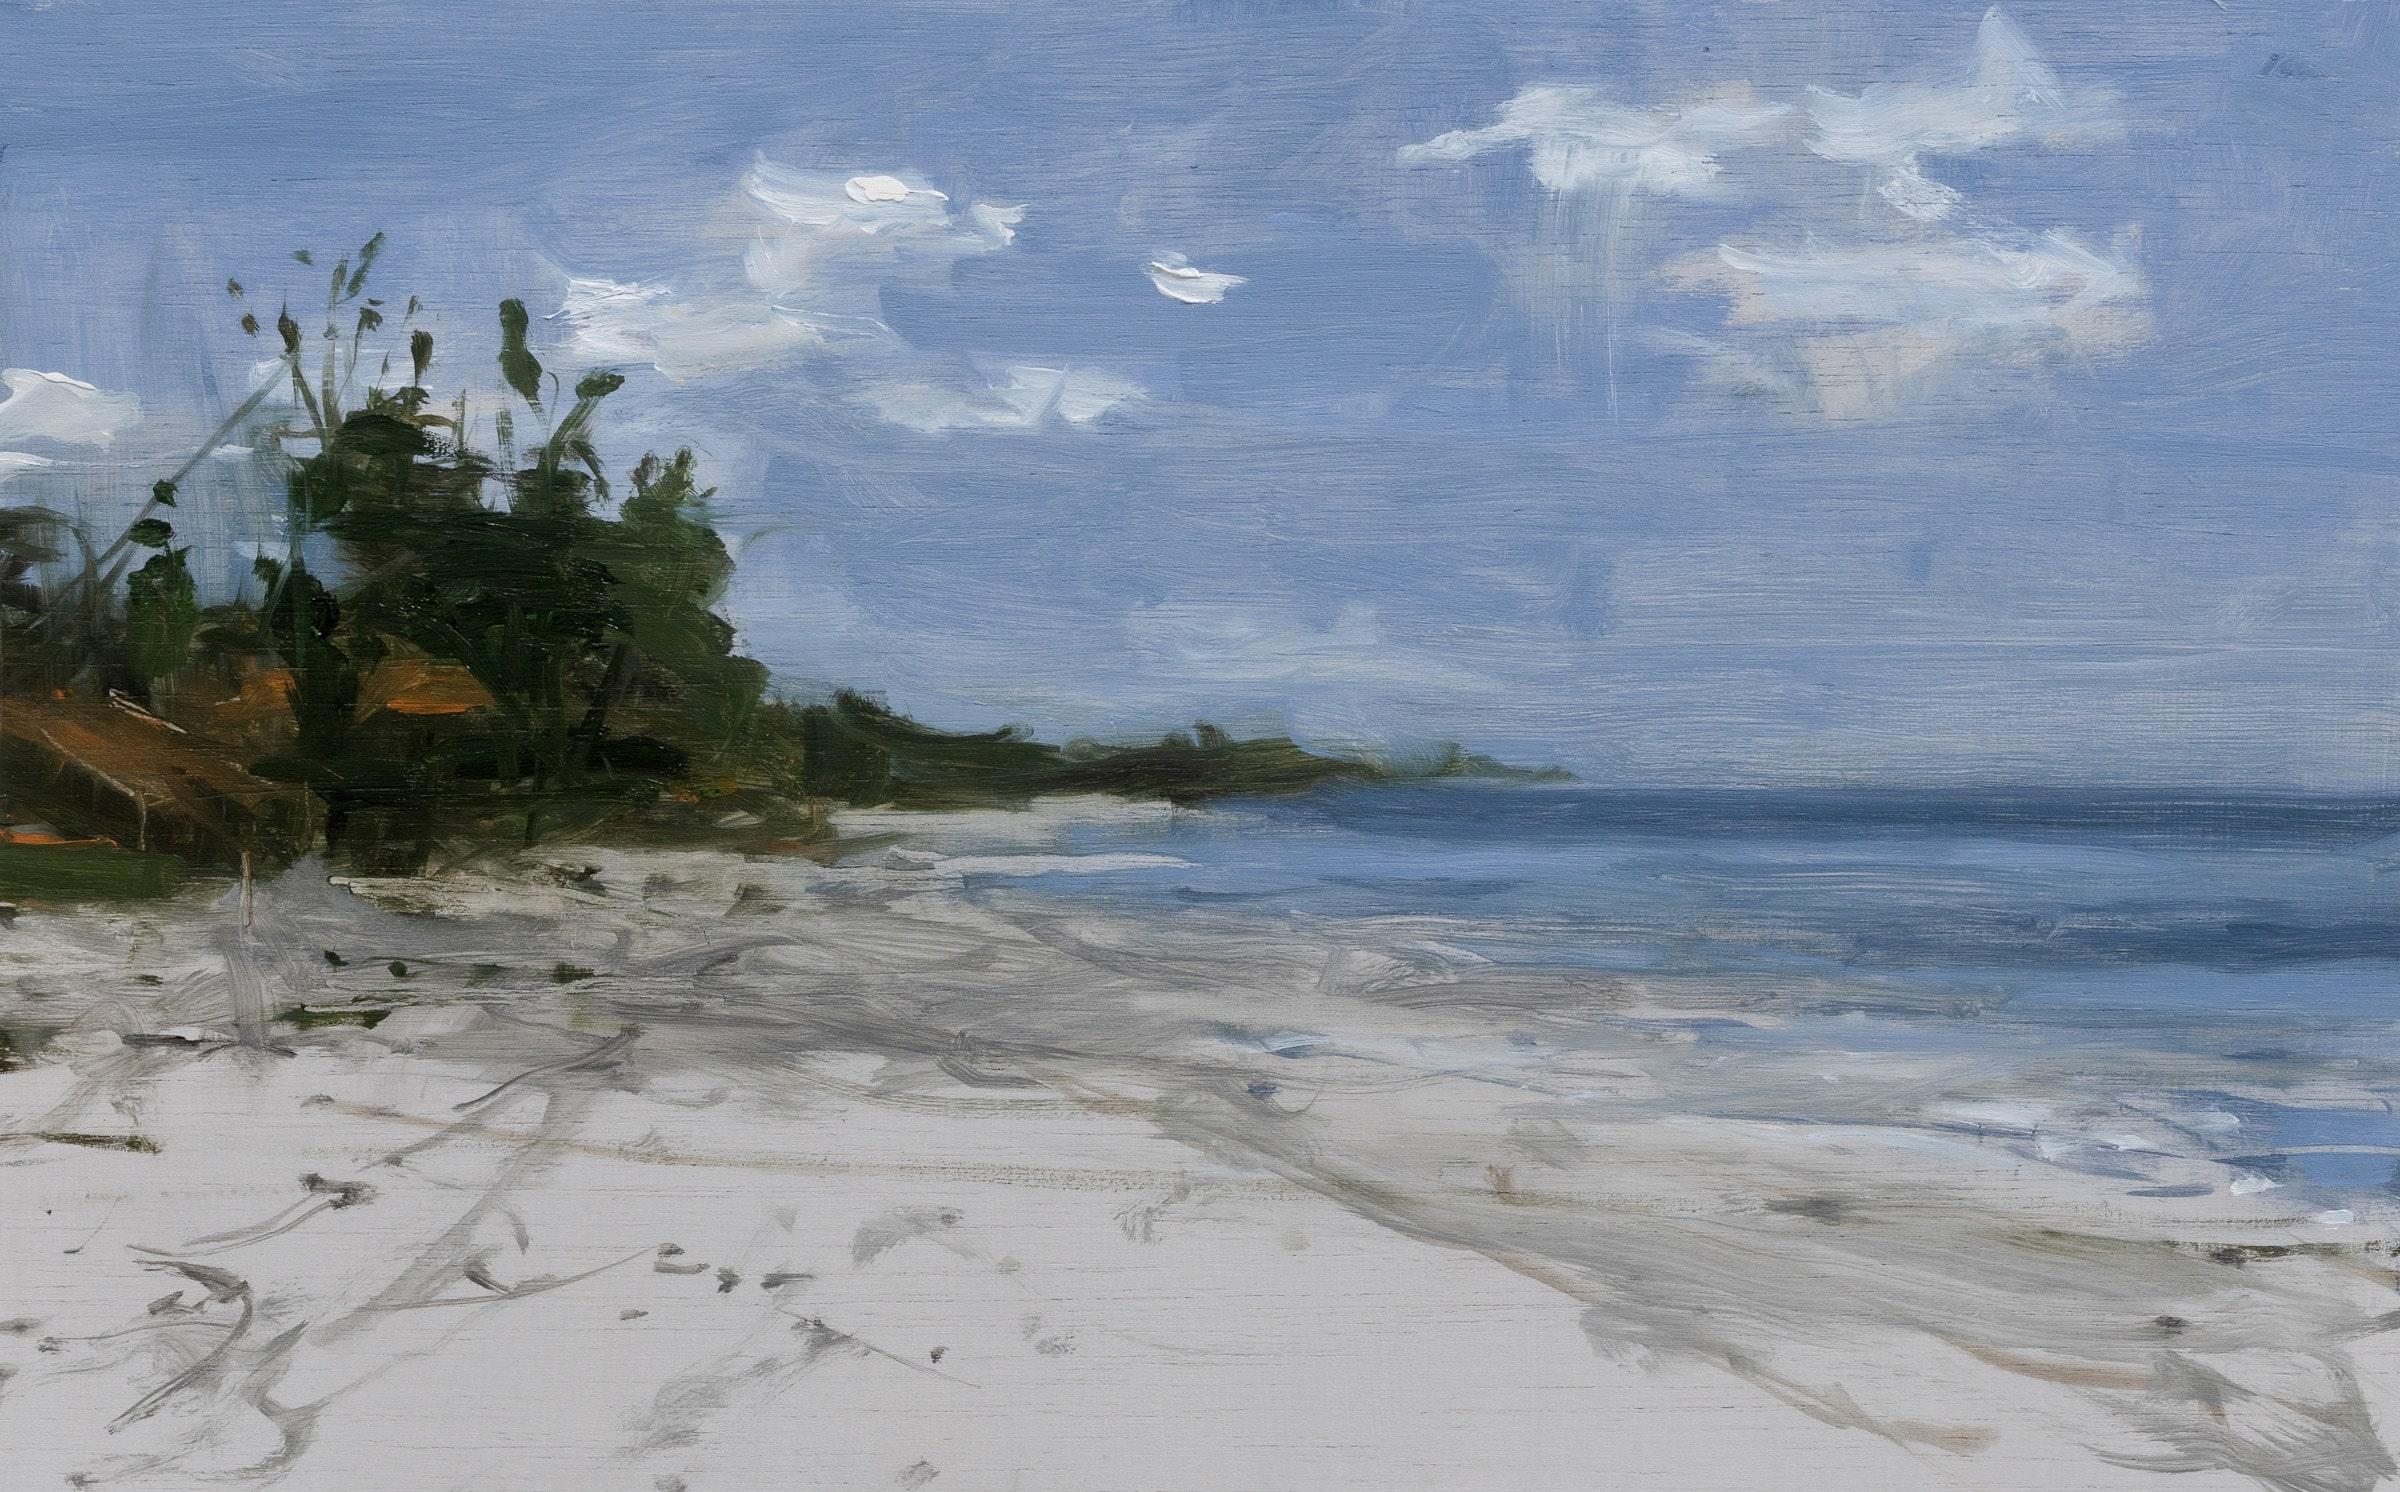 Marinas n°17 (Tanzania) - Landscape Painting